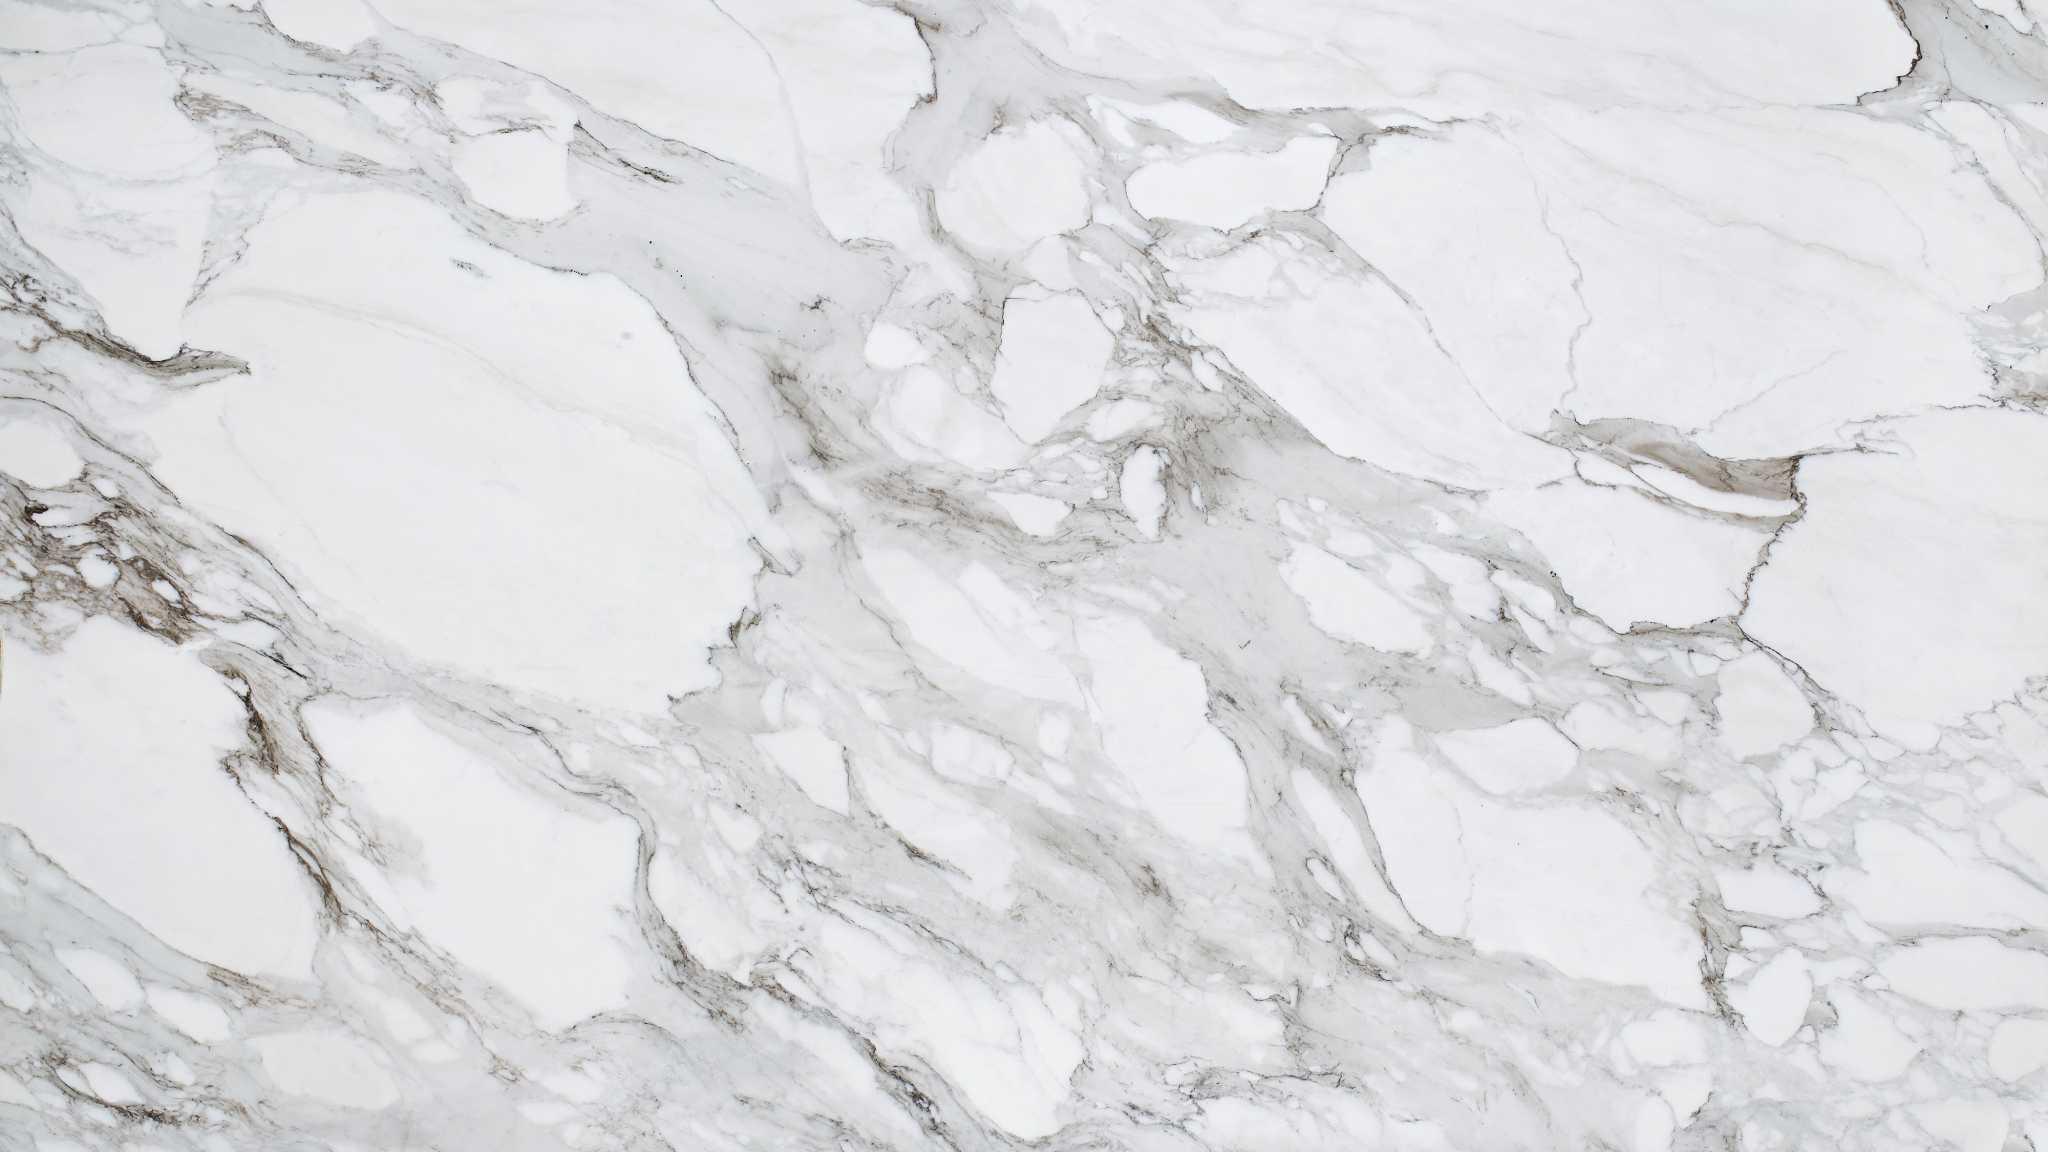 White Marble Desktop Wallpapers - Top Free White Marble ...